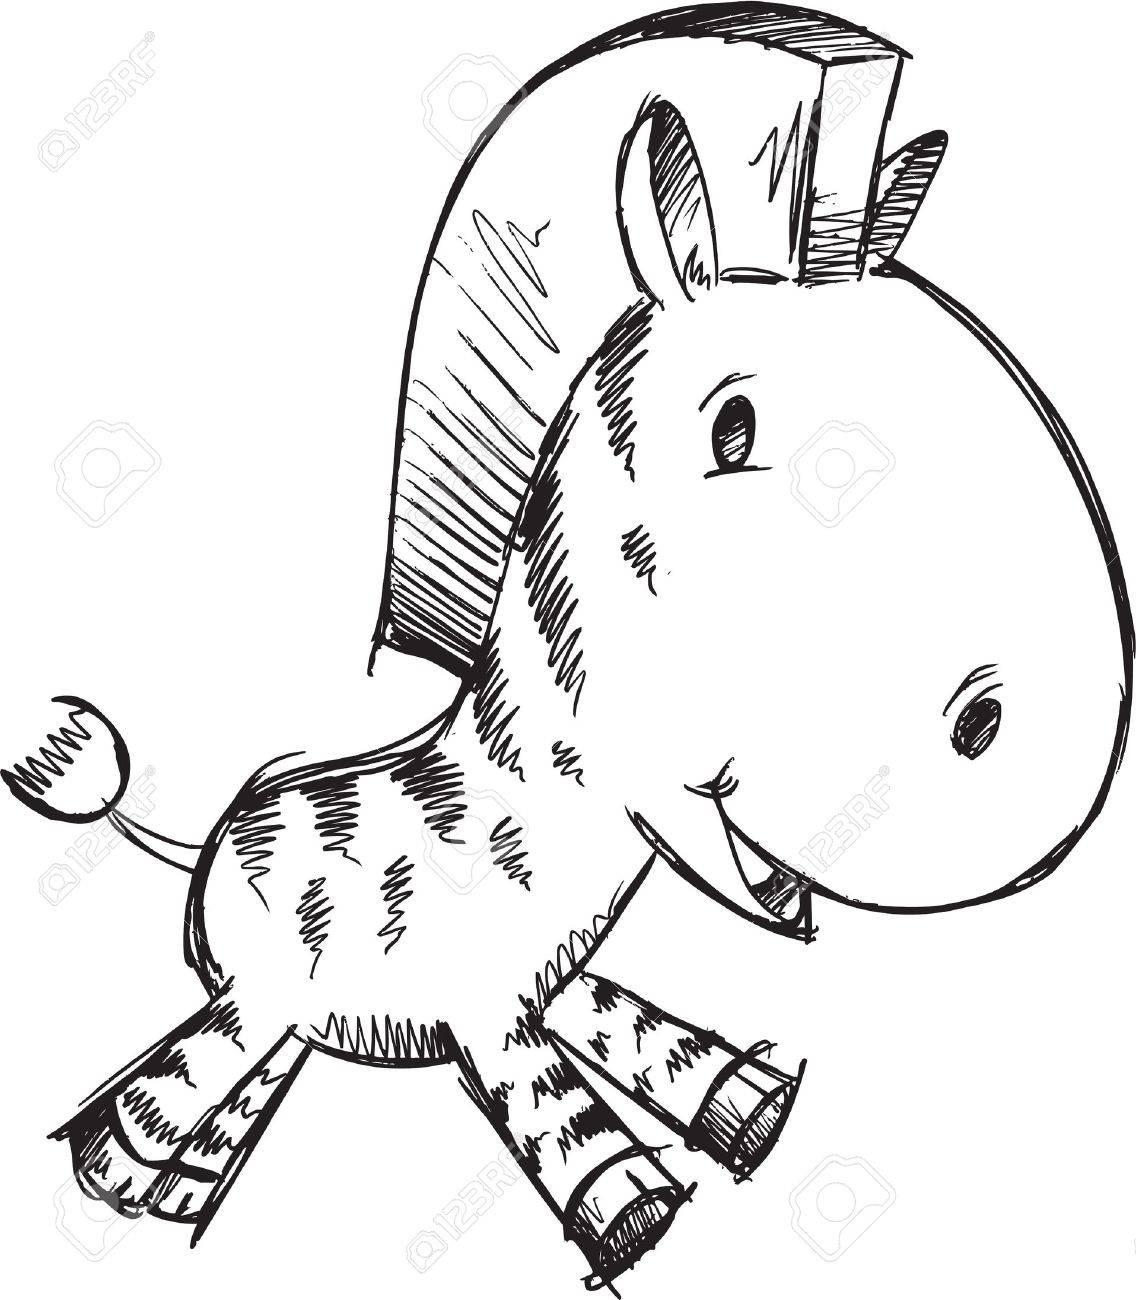 Sketch Doodle Cute Safari Zebra Vector Stock Vector - 19991680